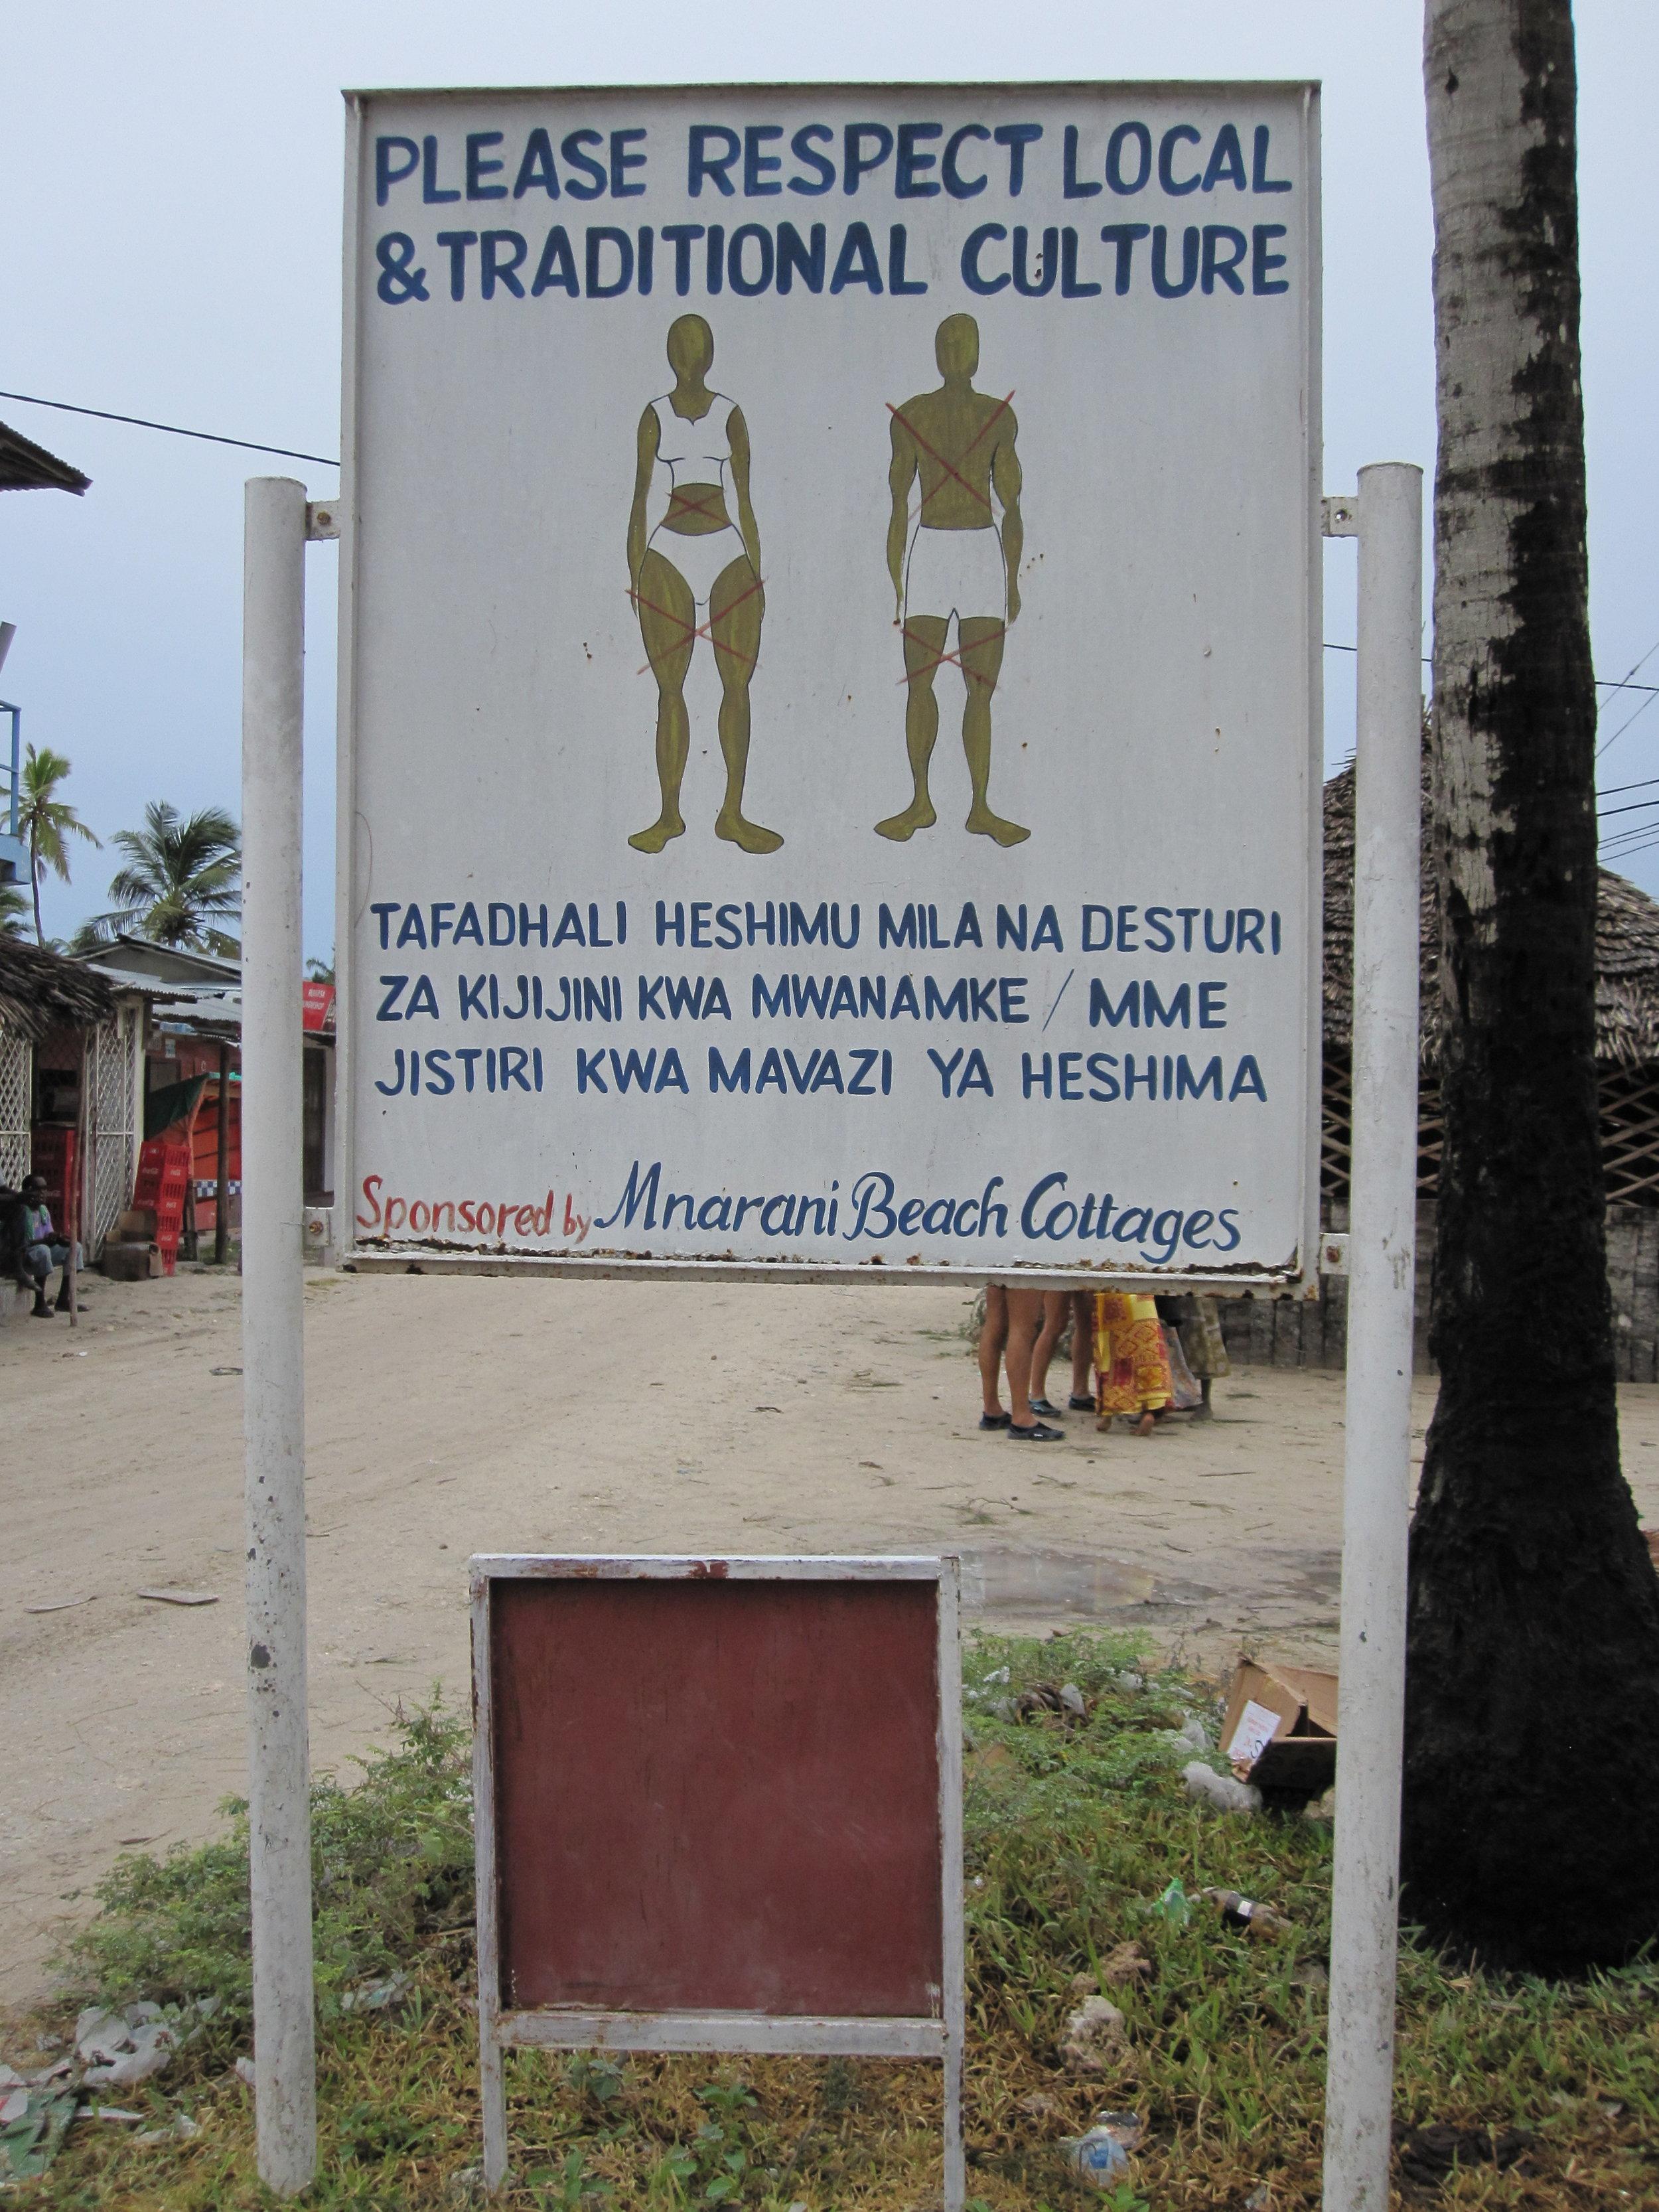 Wardrobe sign at Zanzibar discussing appropriate attire to respect their culture.